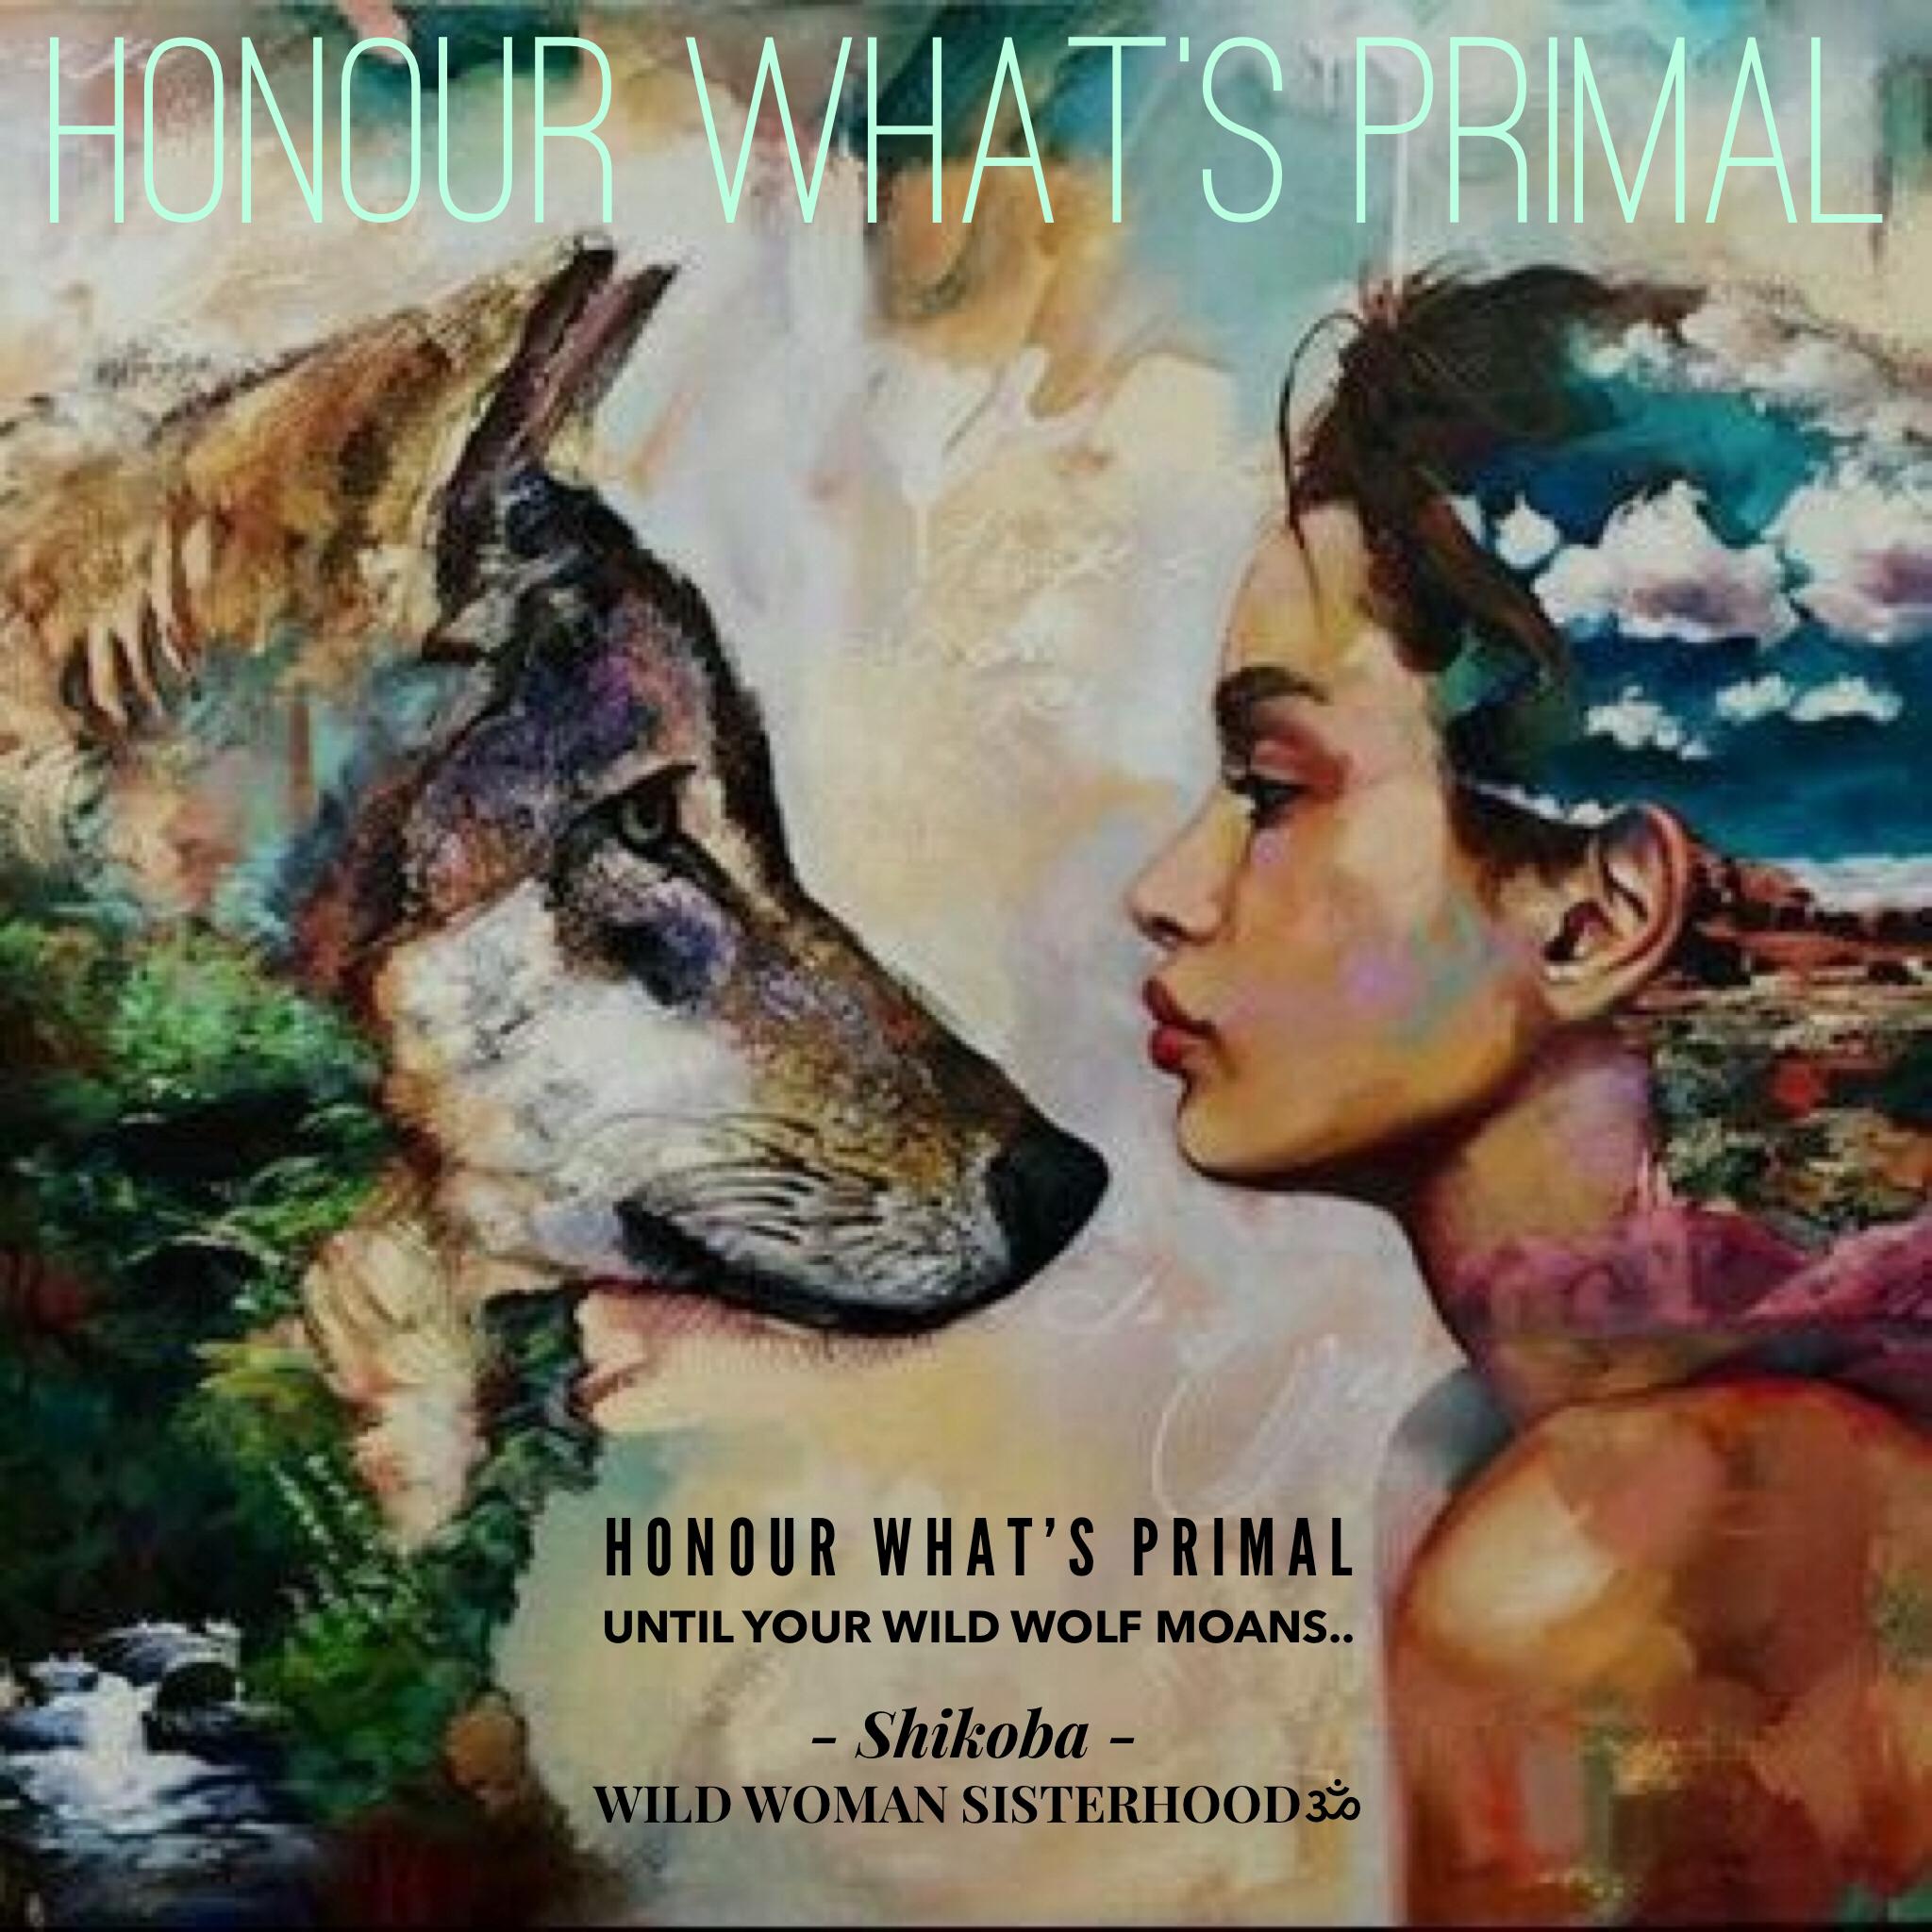 Honour what's primal until your wild wolf moans.. - Shikoba. WILD WOMAN SISTERHOODॐ #WildWomanSisterhood #Shikoba #mothershikoba #wildwomen #wildwomanmedicine #embodyyourwildnature